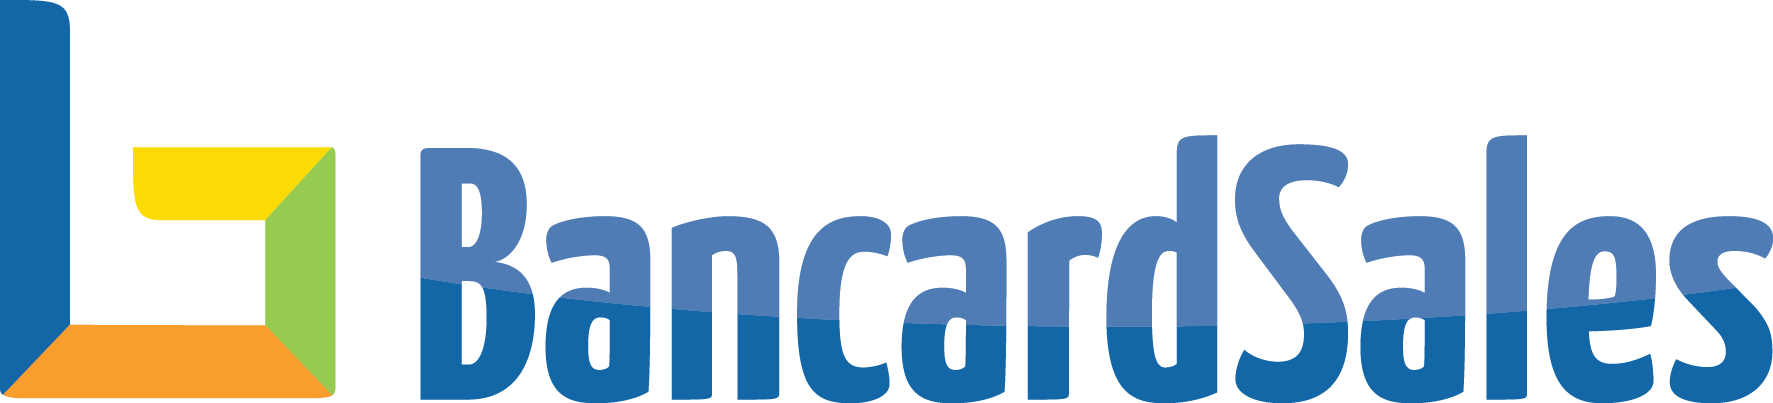 Bancardsales.com